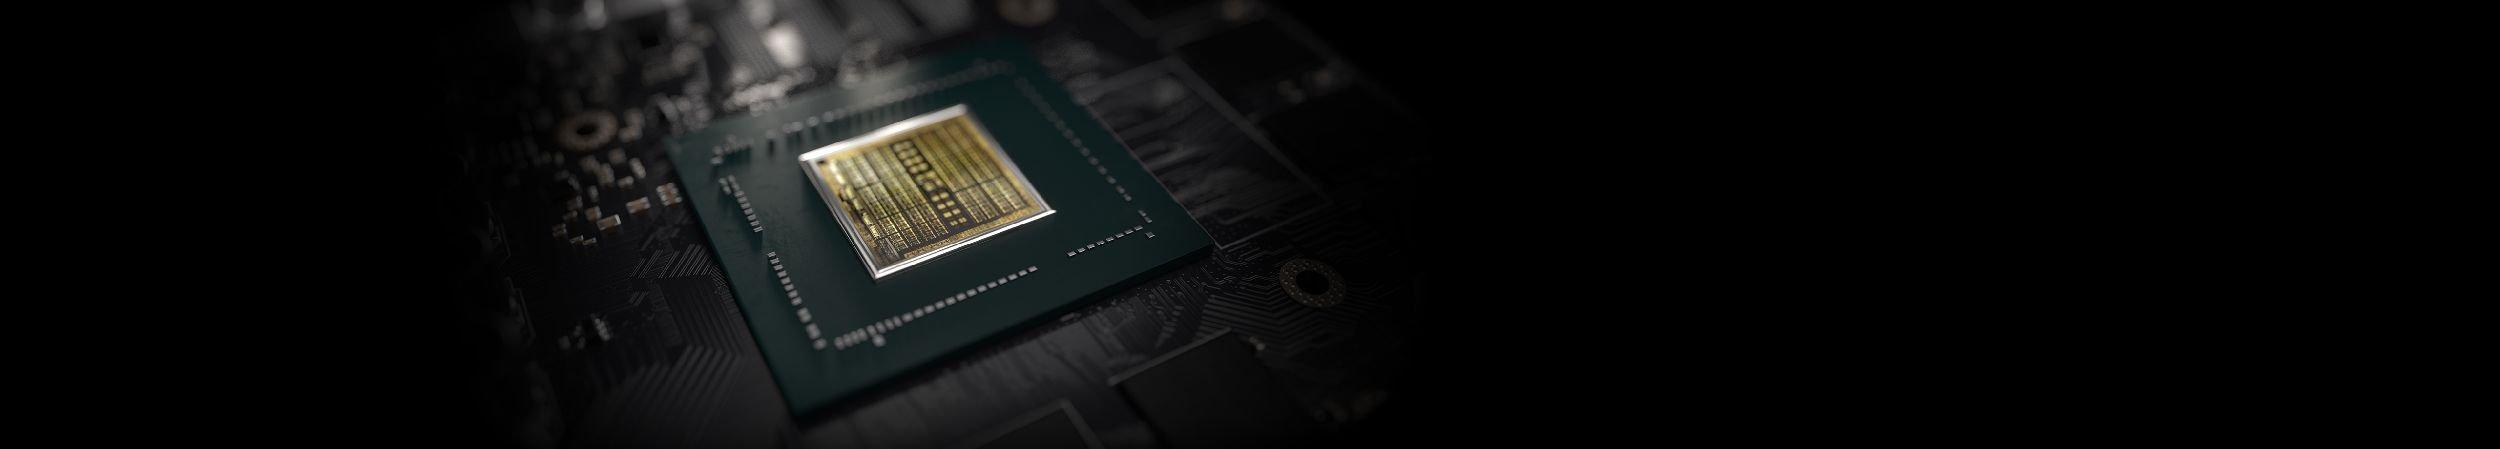 PNY GeForce GTX1650 4GB (VCG16504D6DFPPB) - фото 6130188_2019_08_06_13_22_491160640230.jpeg